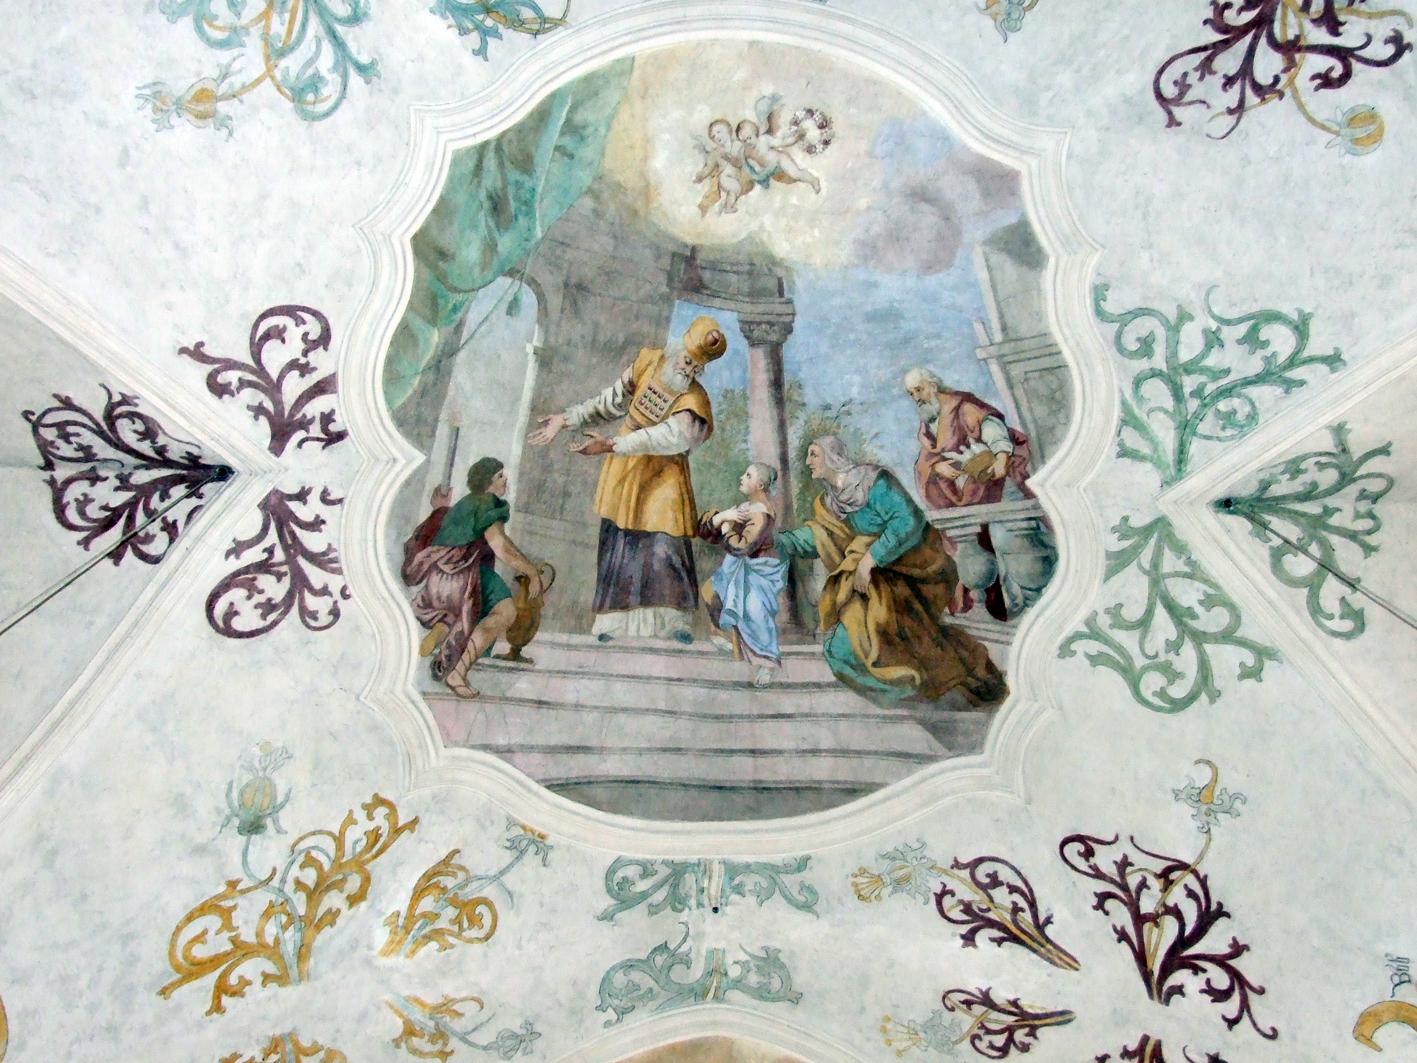 2021 05 17 aoelfb niedergottsau kirche mariae himmelfahrt fresko mariae opferung